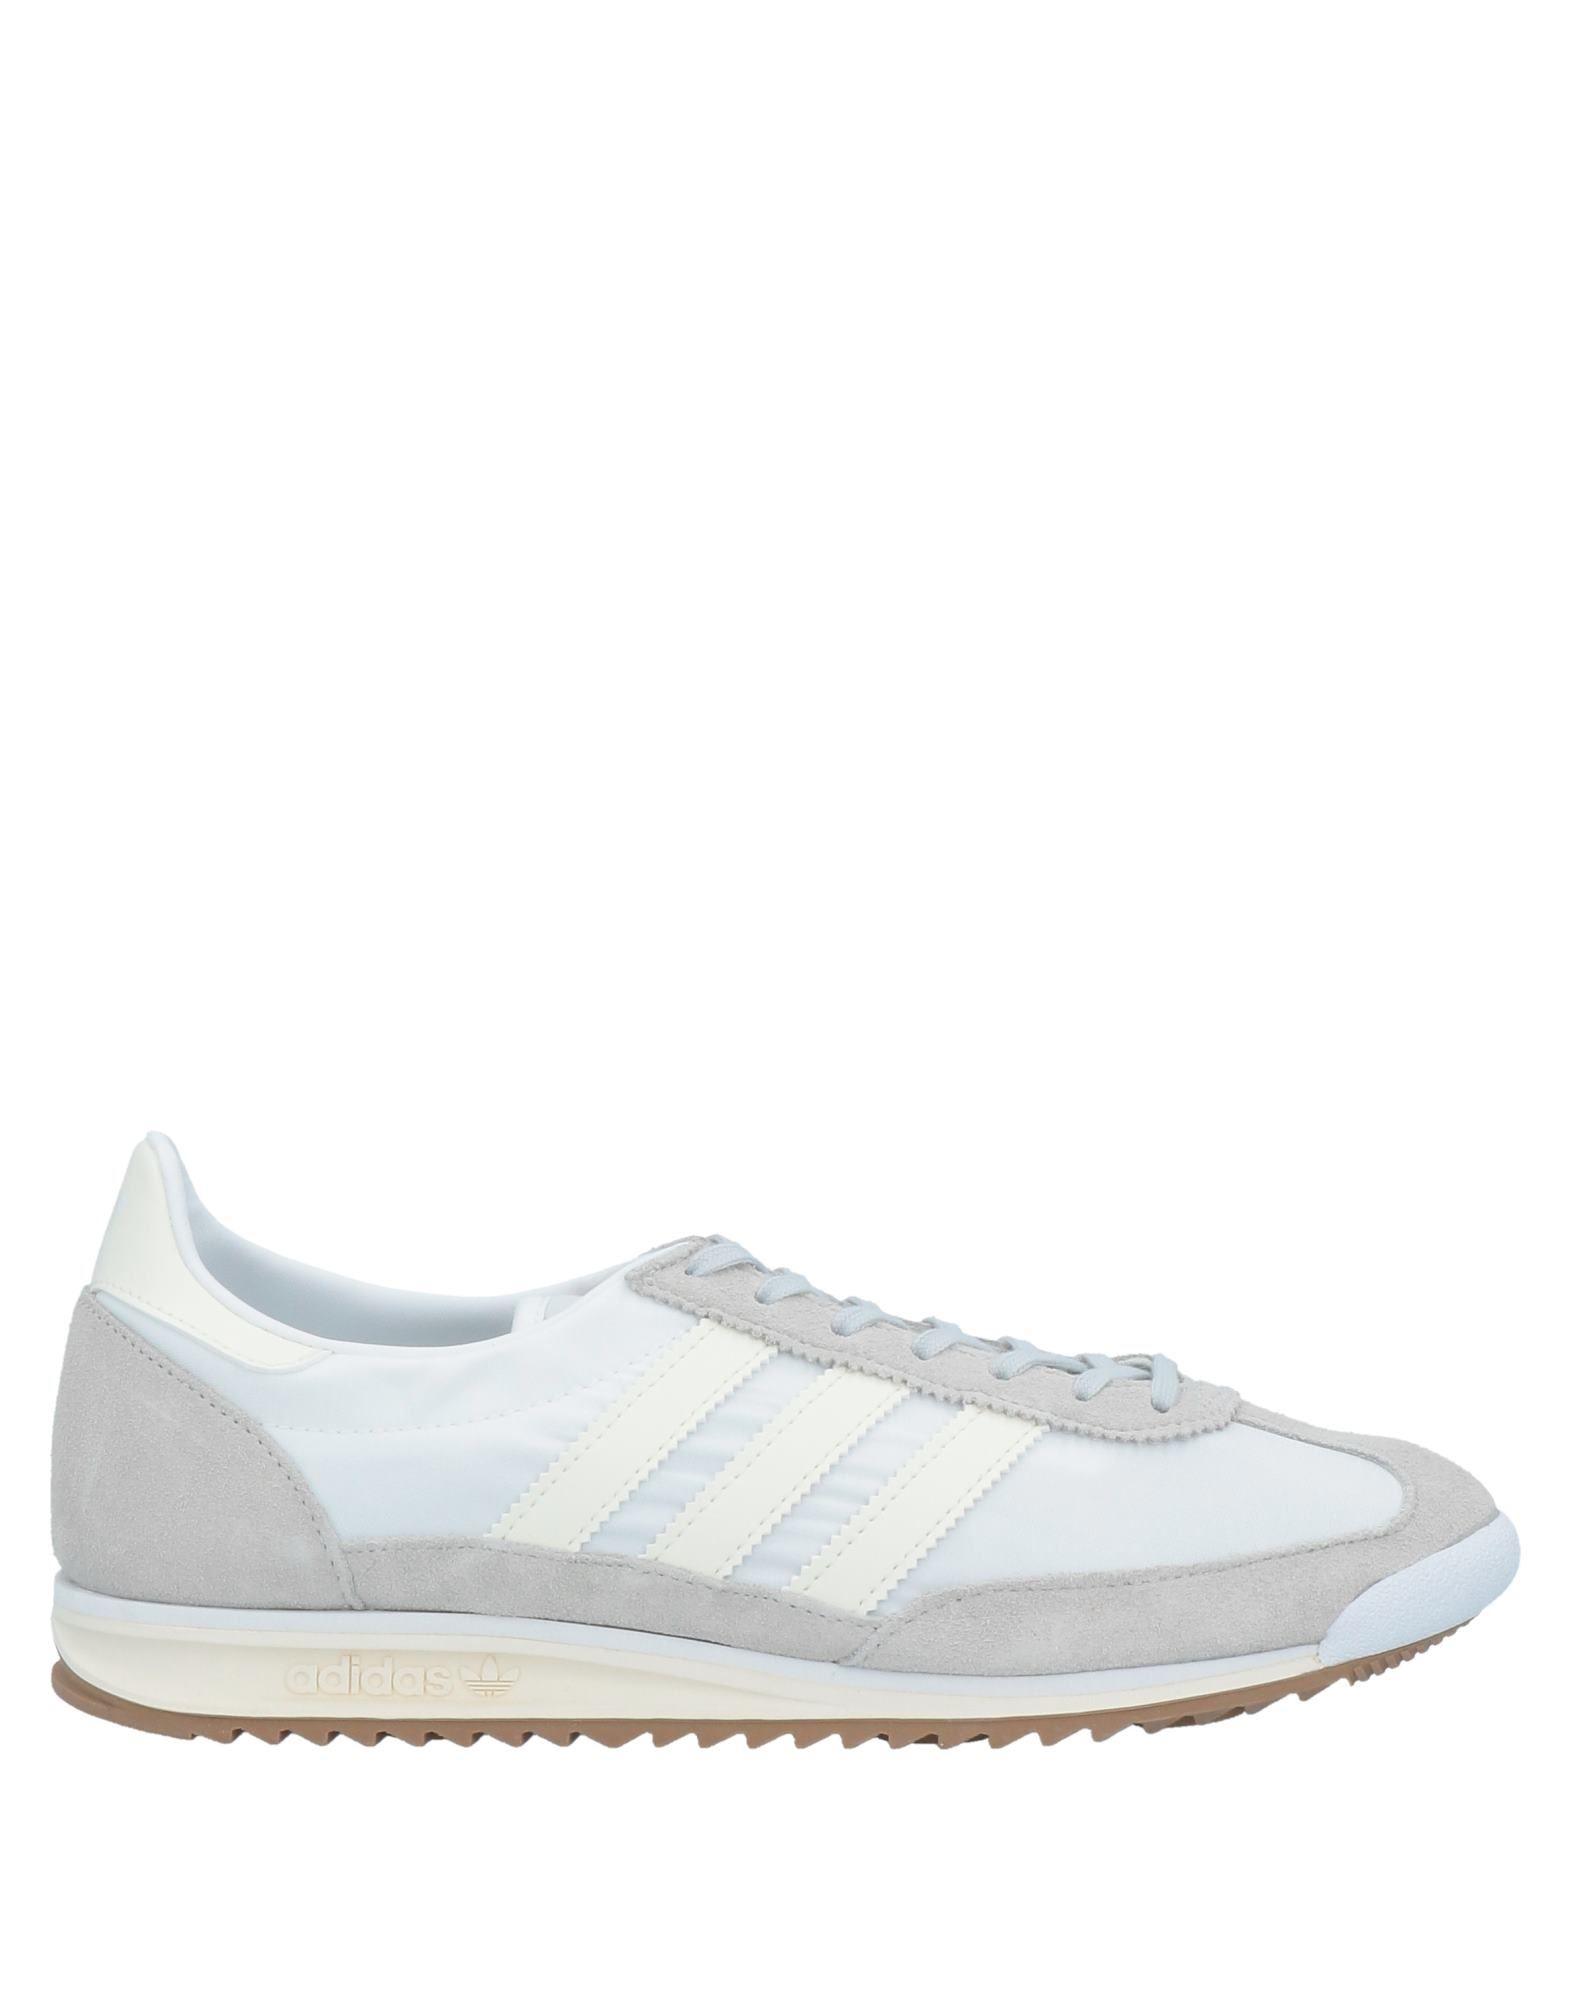 Adidas Originals X Lotta Volkova Sneakers In White